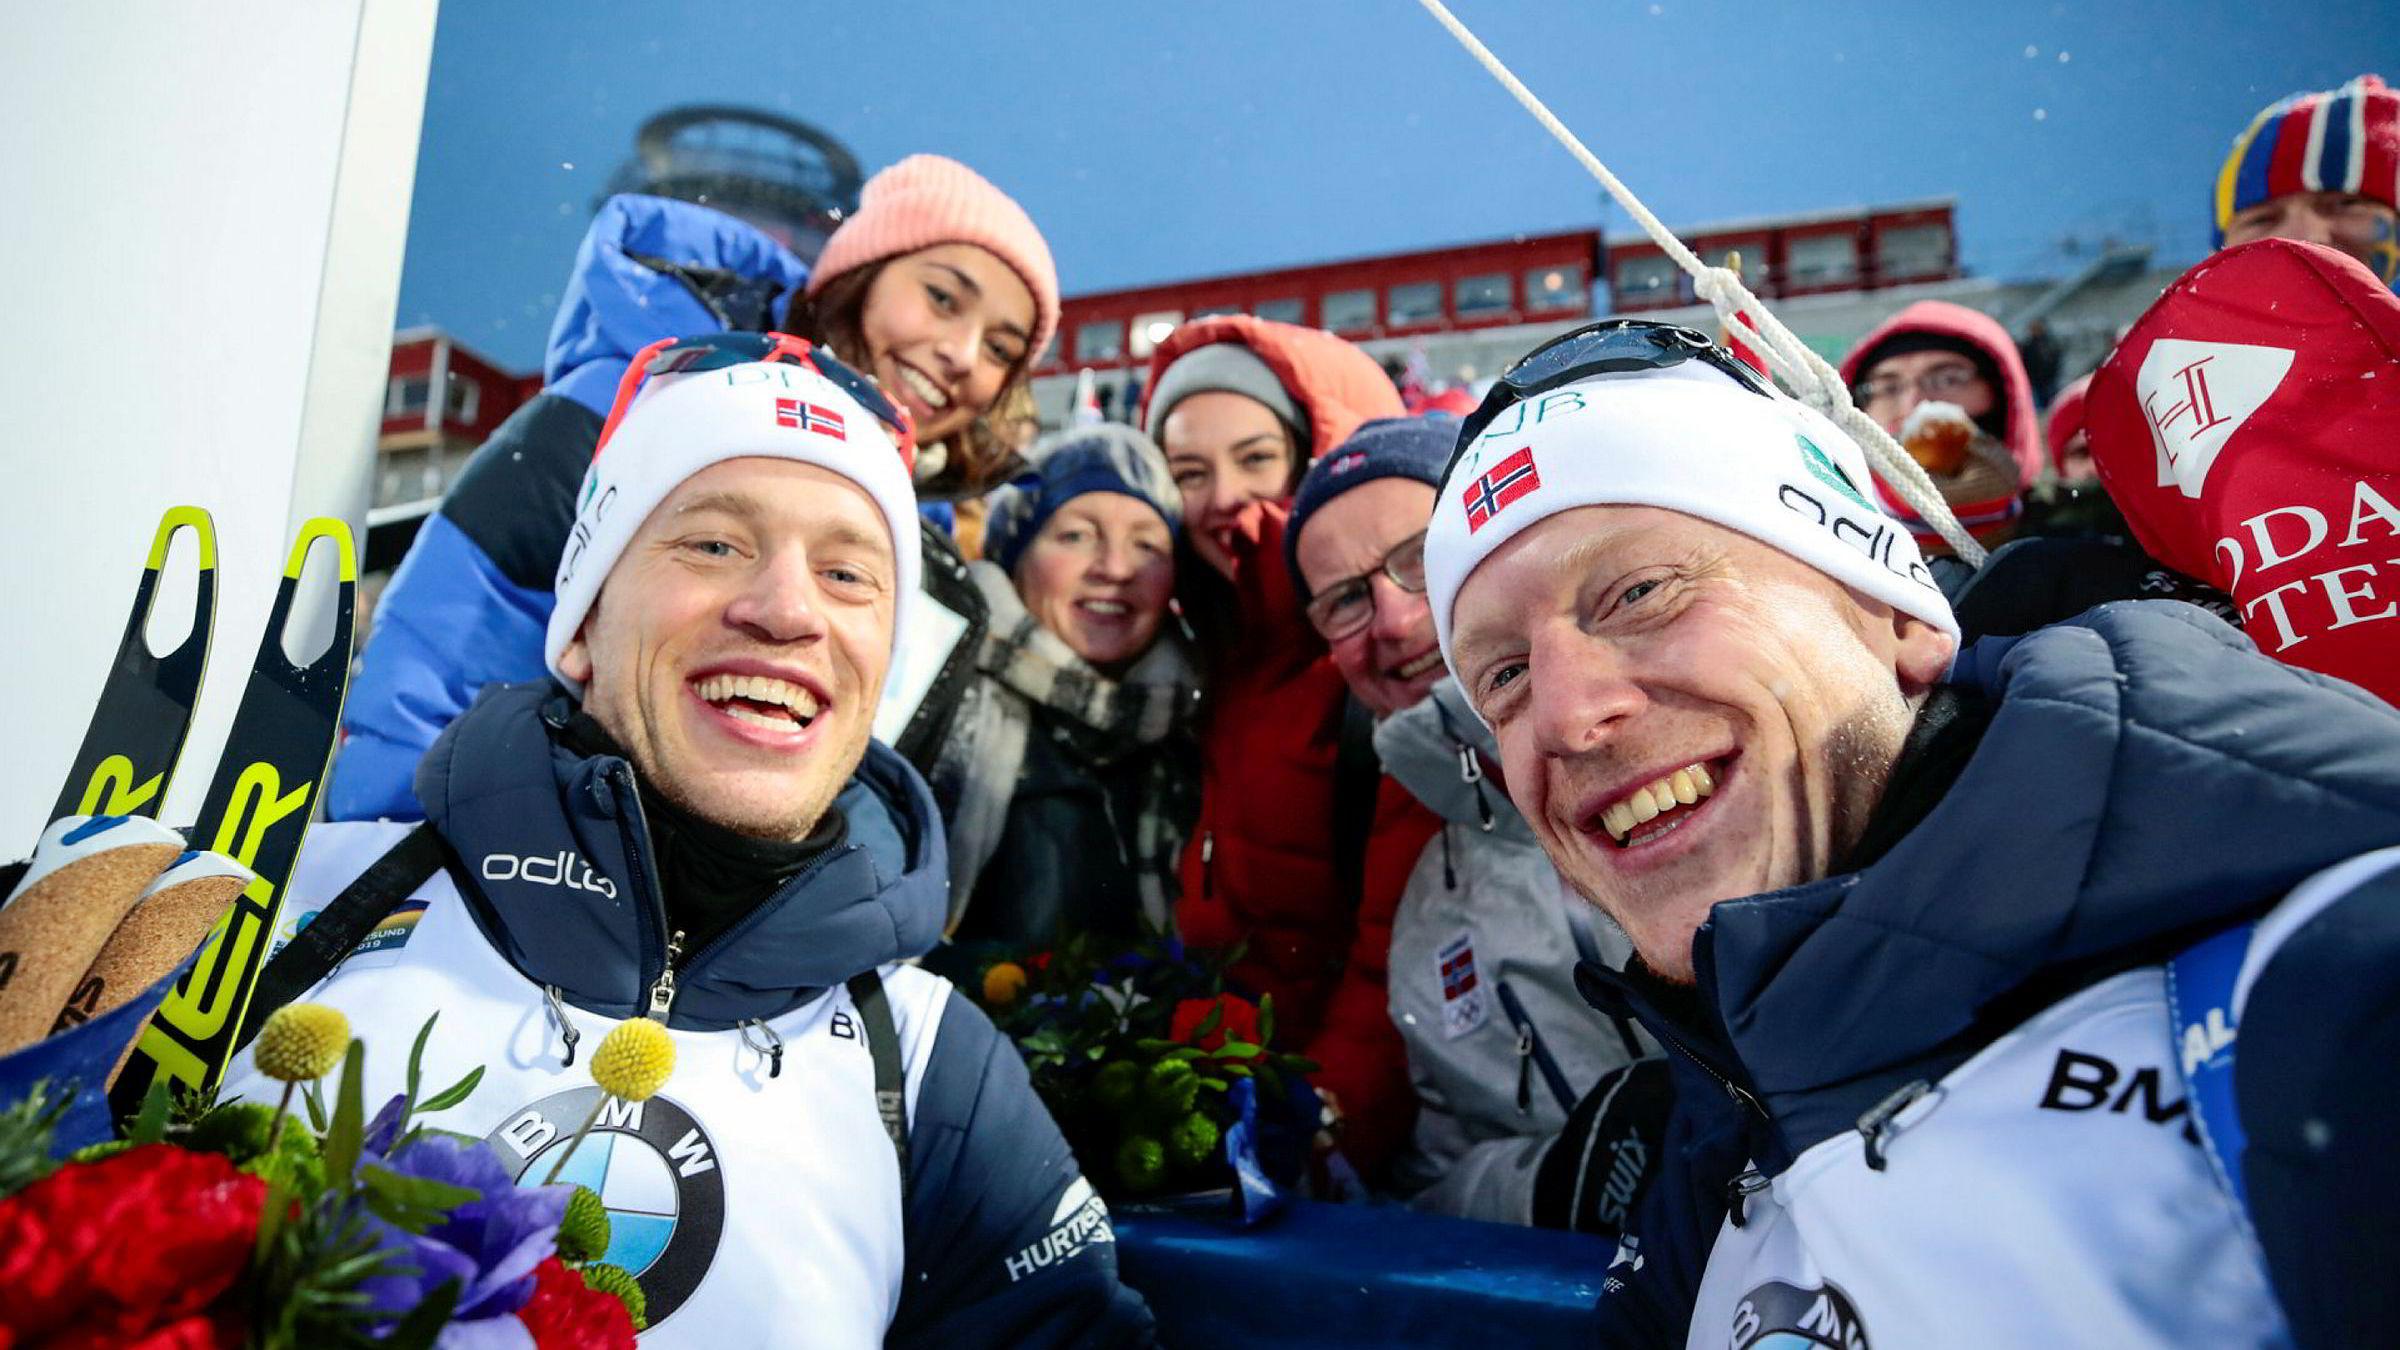 Johannes Thingnes Bø (t.v.), far Klemet Bø, mor Aslaug Thingnes Bø, Gita Simonsen, Hedda Kløvstad Dæhli og Tarjei Bø etter stafettgullet for menn i VM Skiskyting 2019 i Östersund, Sverige